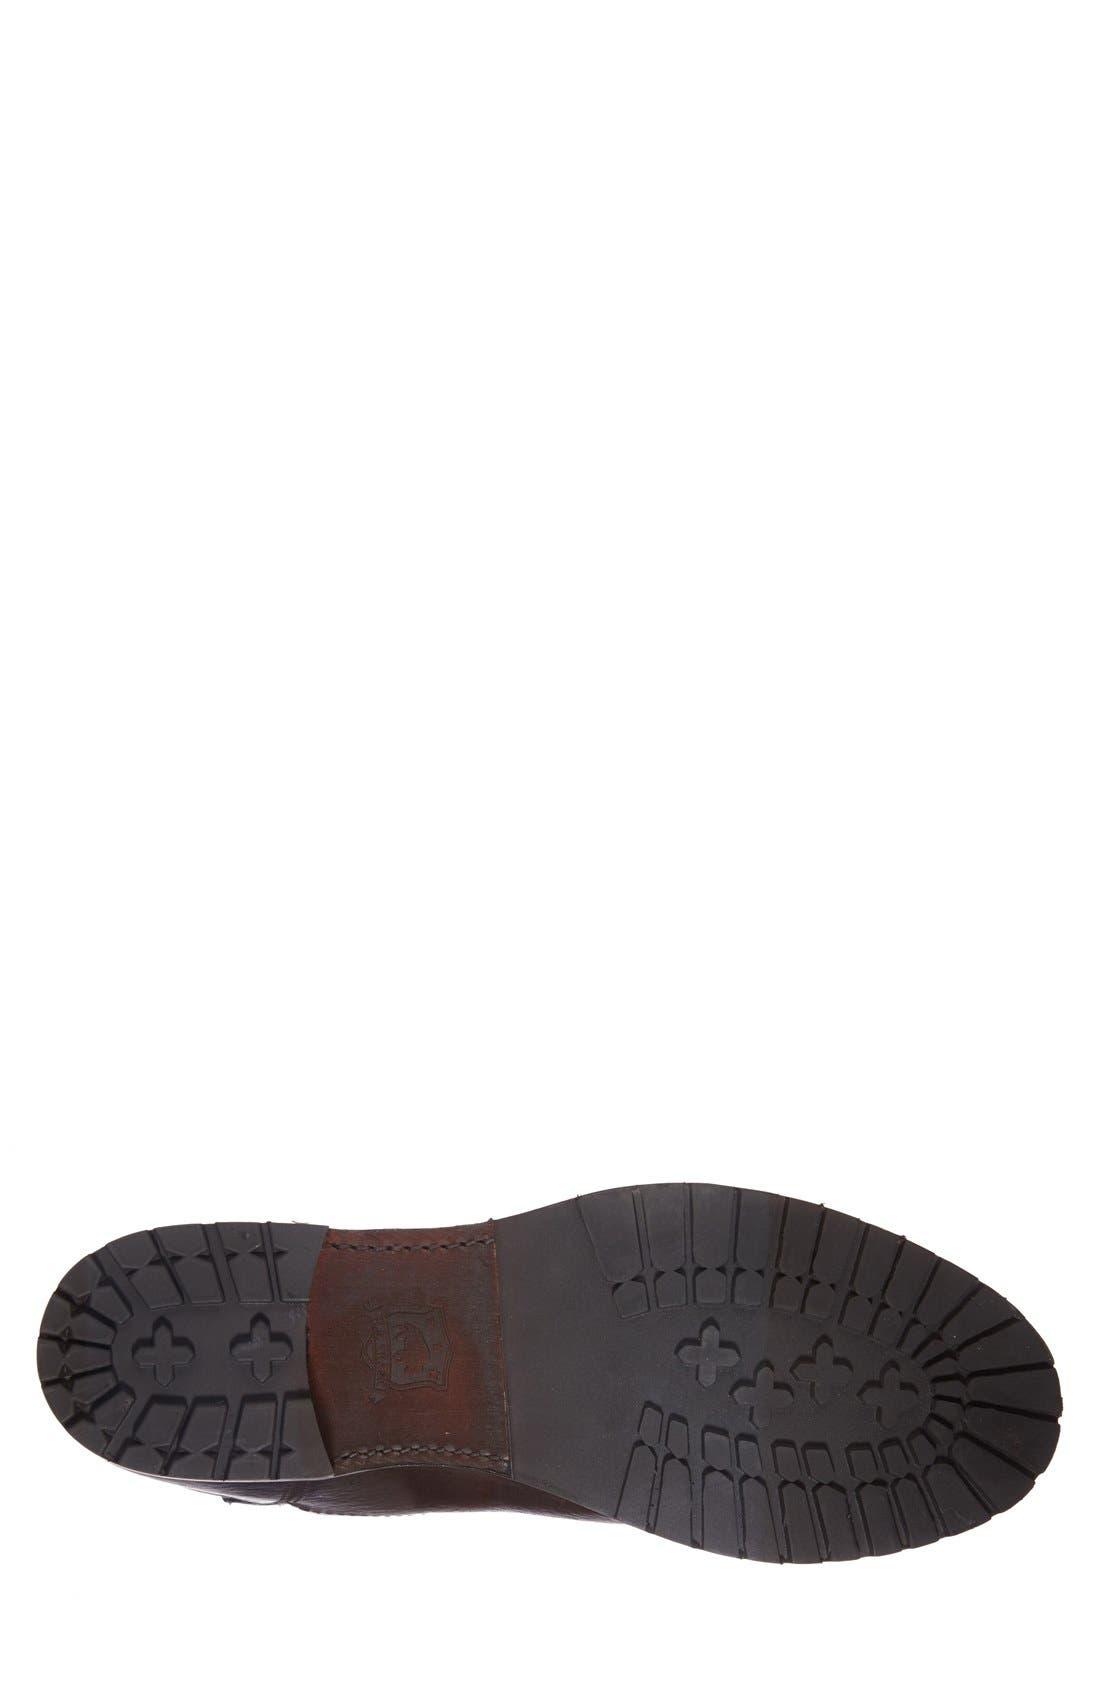 'Austin' Boot,                             Alternate thumbnail 2, color,                             Bourbon